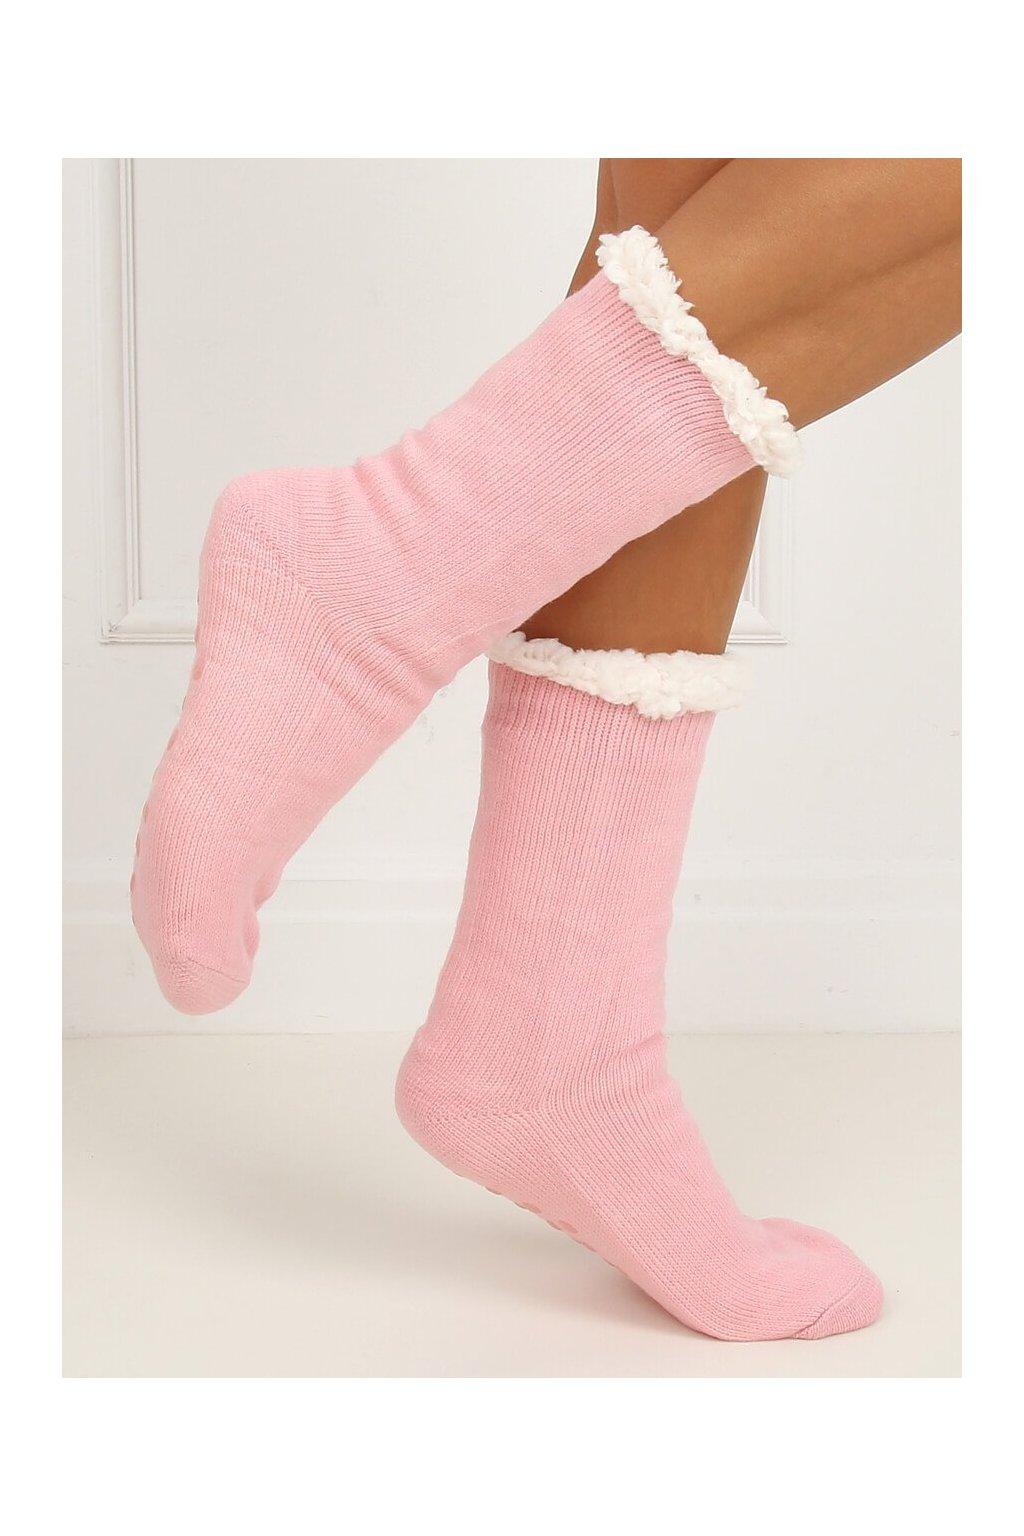 Damske ponožky ružové NJSK DN012